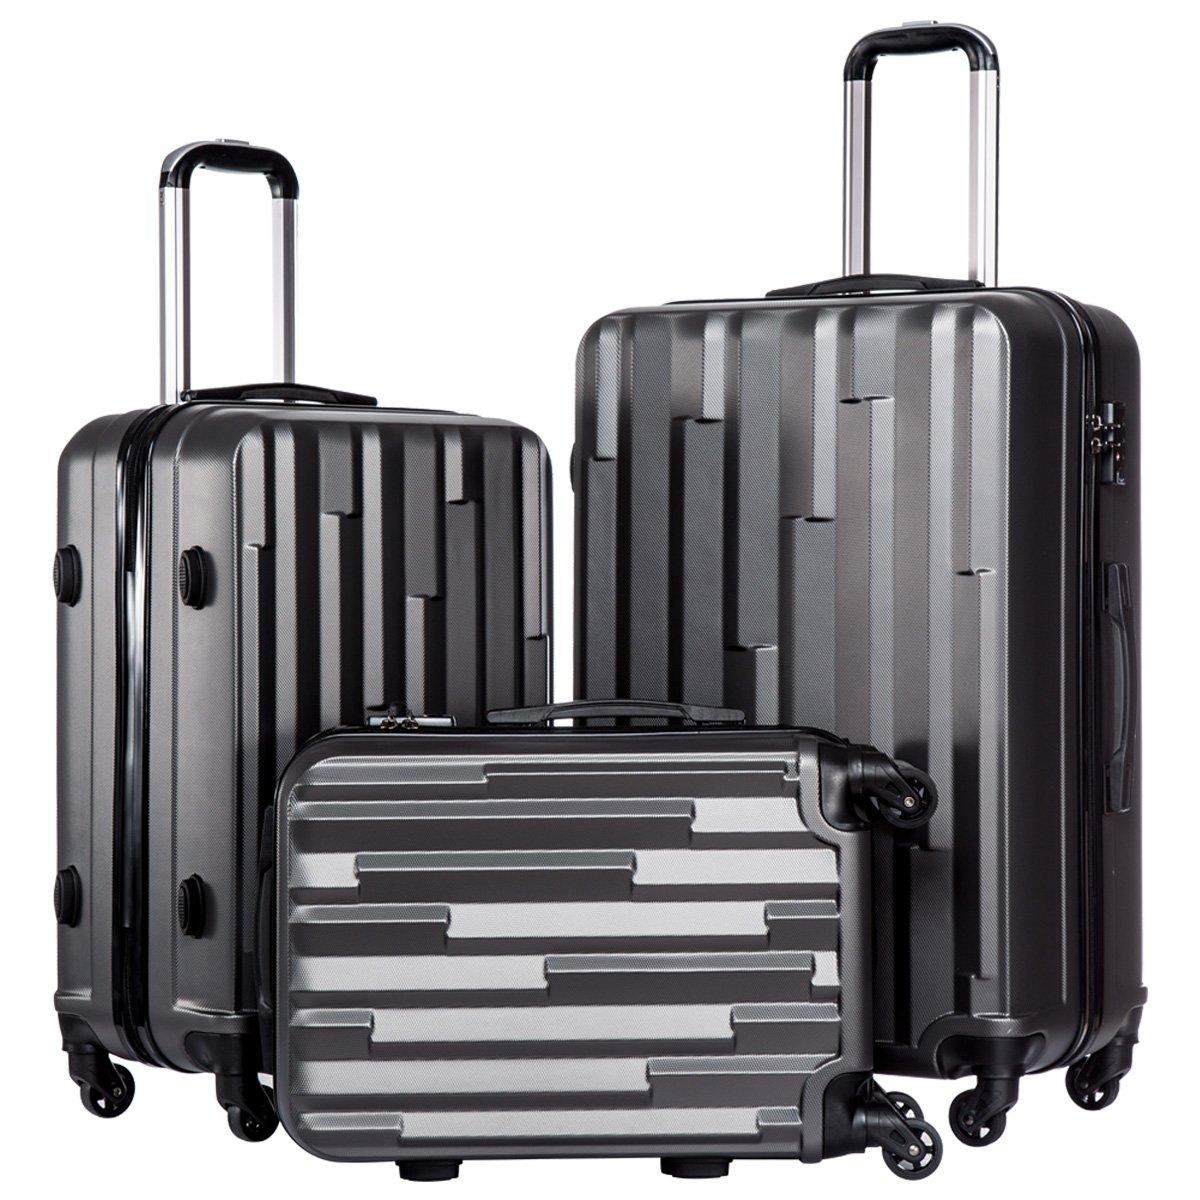 Coolife Luggage Suitcase 3 Piece Set with TSA Lock Spinner Hardshell Lightweight (gray)